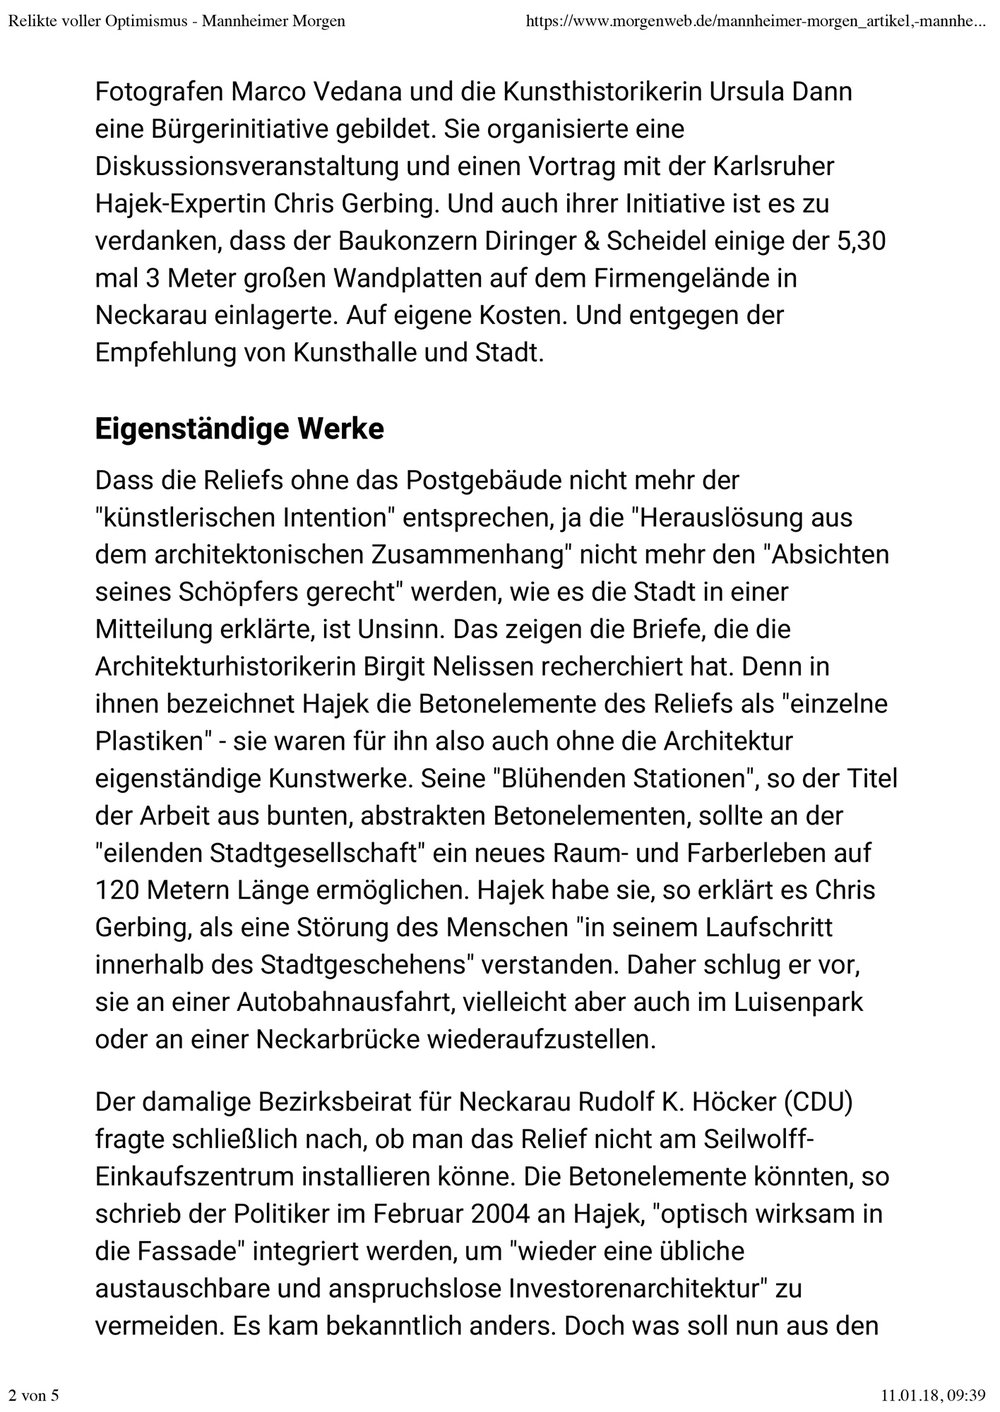 Relikte-voller-Optimismus---Mannheimer-Morgen-2.jpg